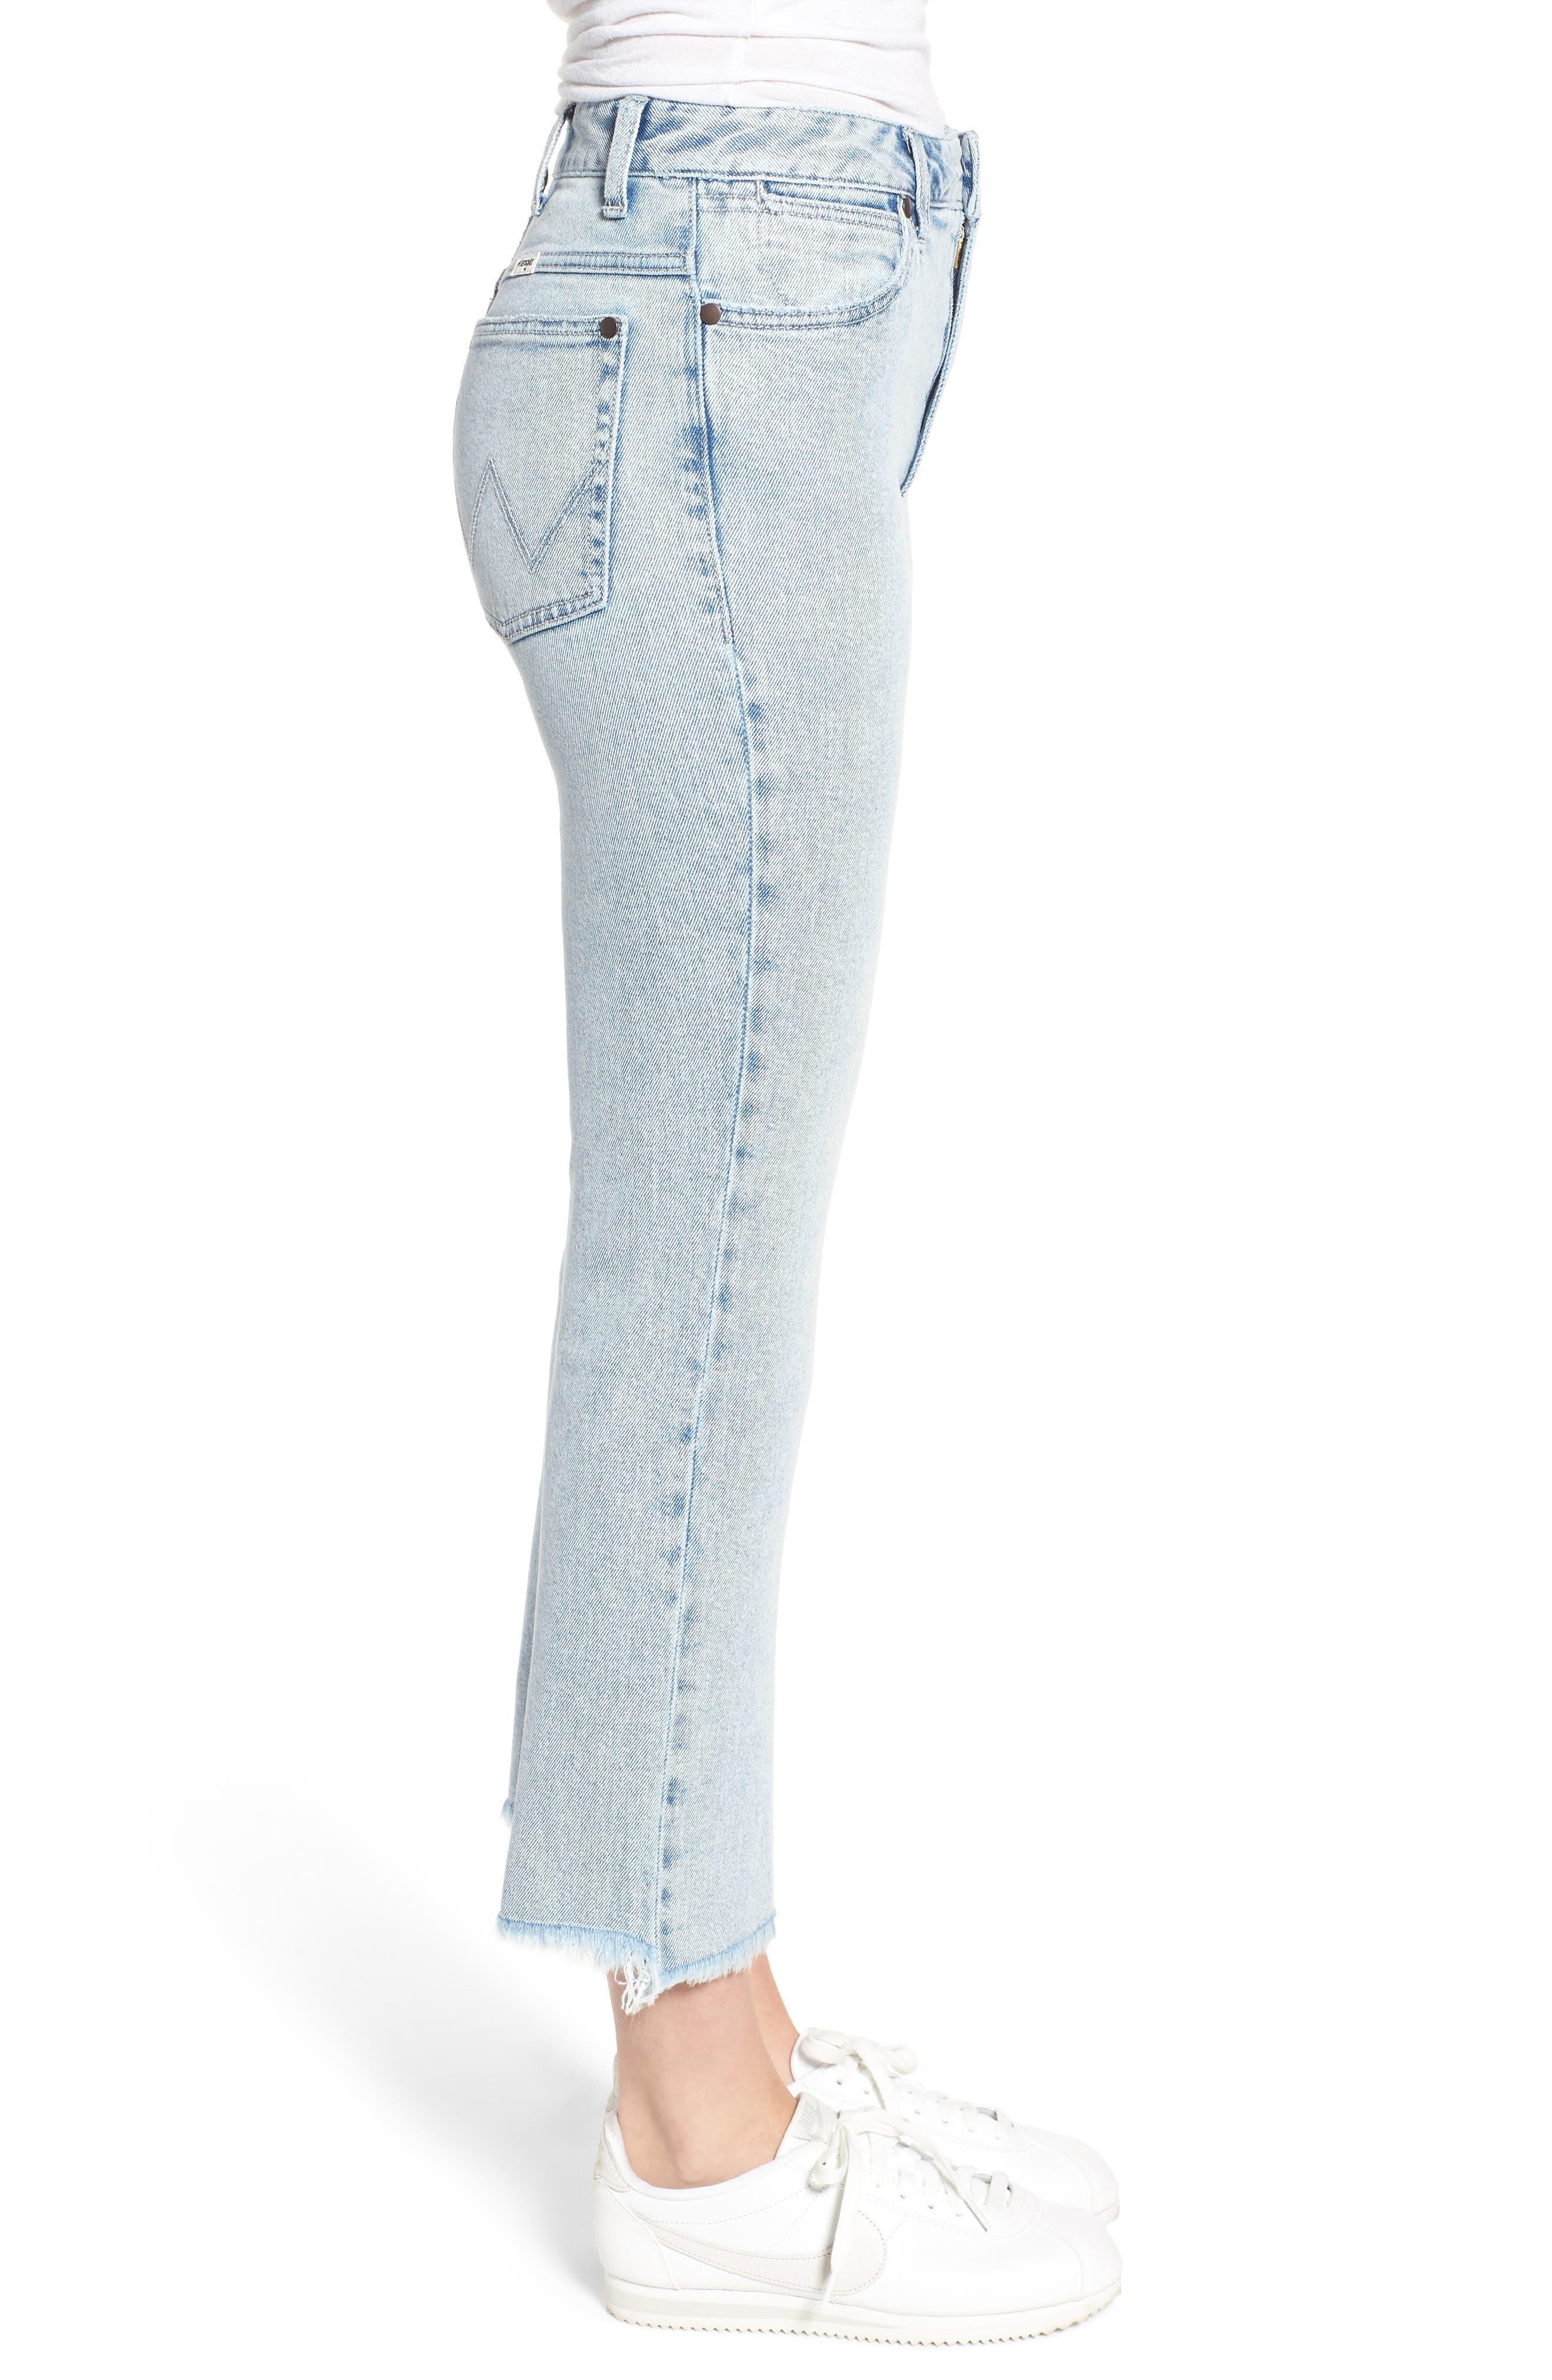 WRANGLER,                             Acid Wash High Waist Crop Jeans,                             Alternate thumbnail 3, color,                             454